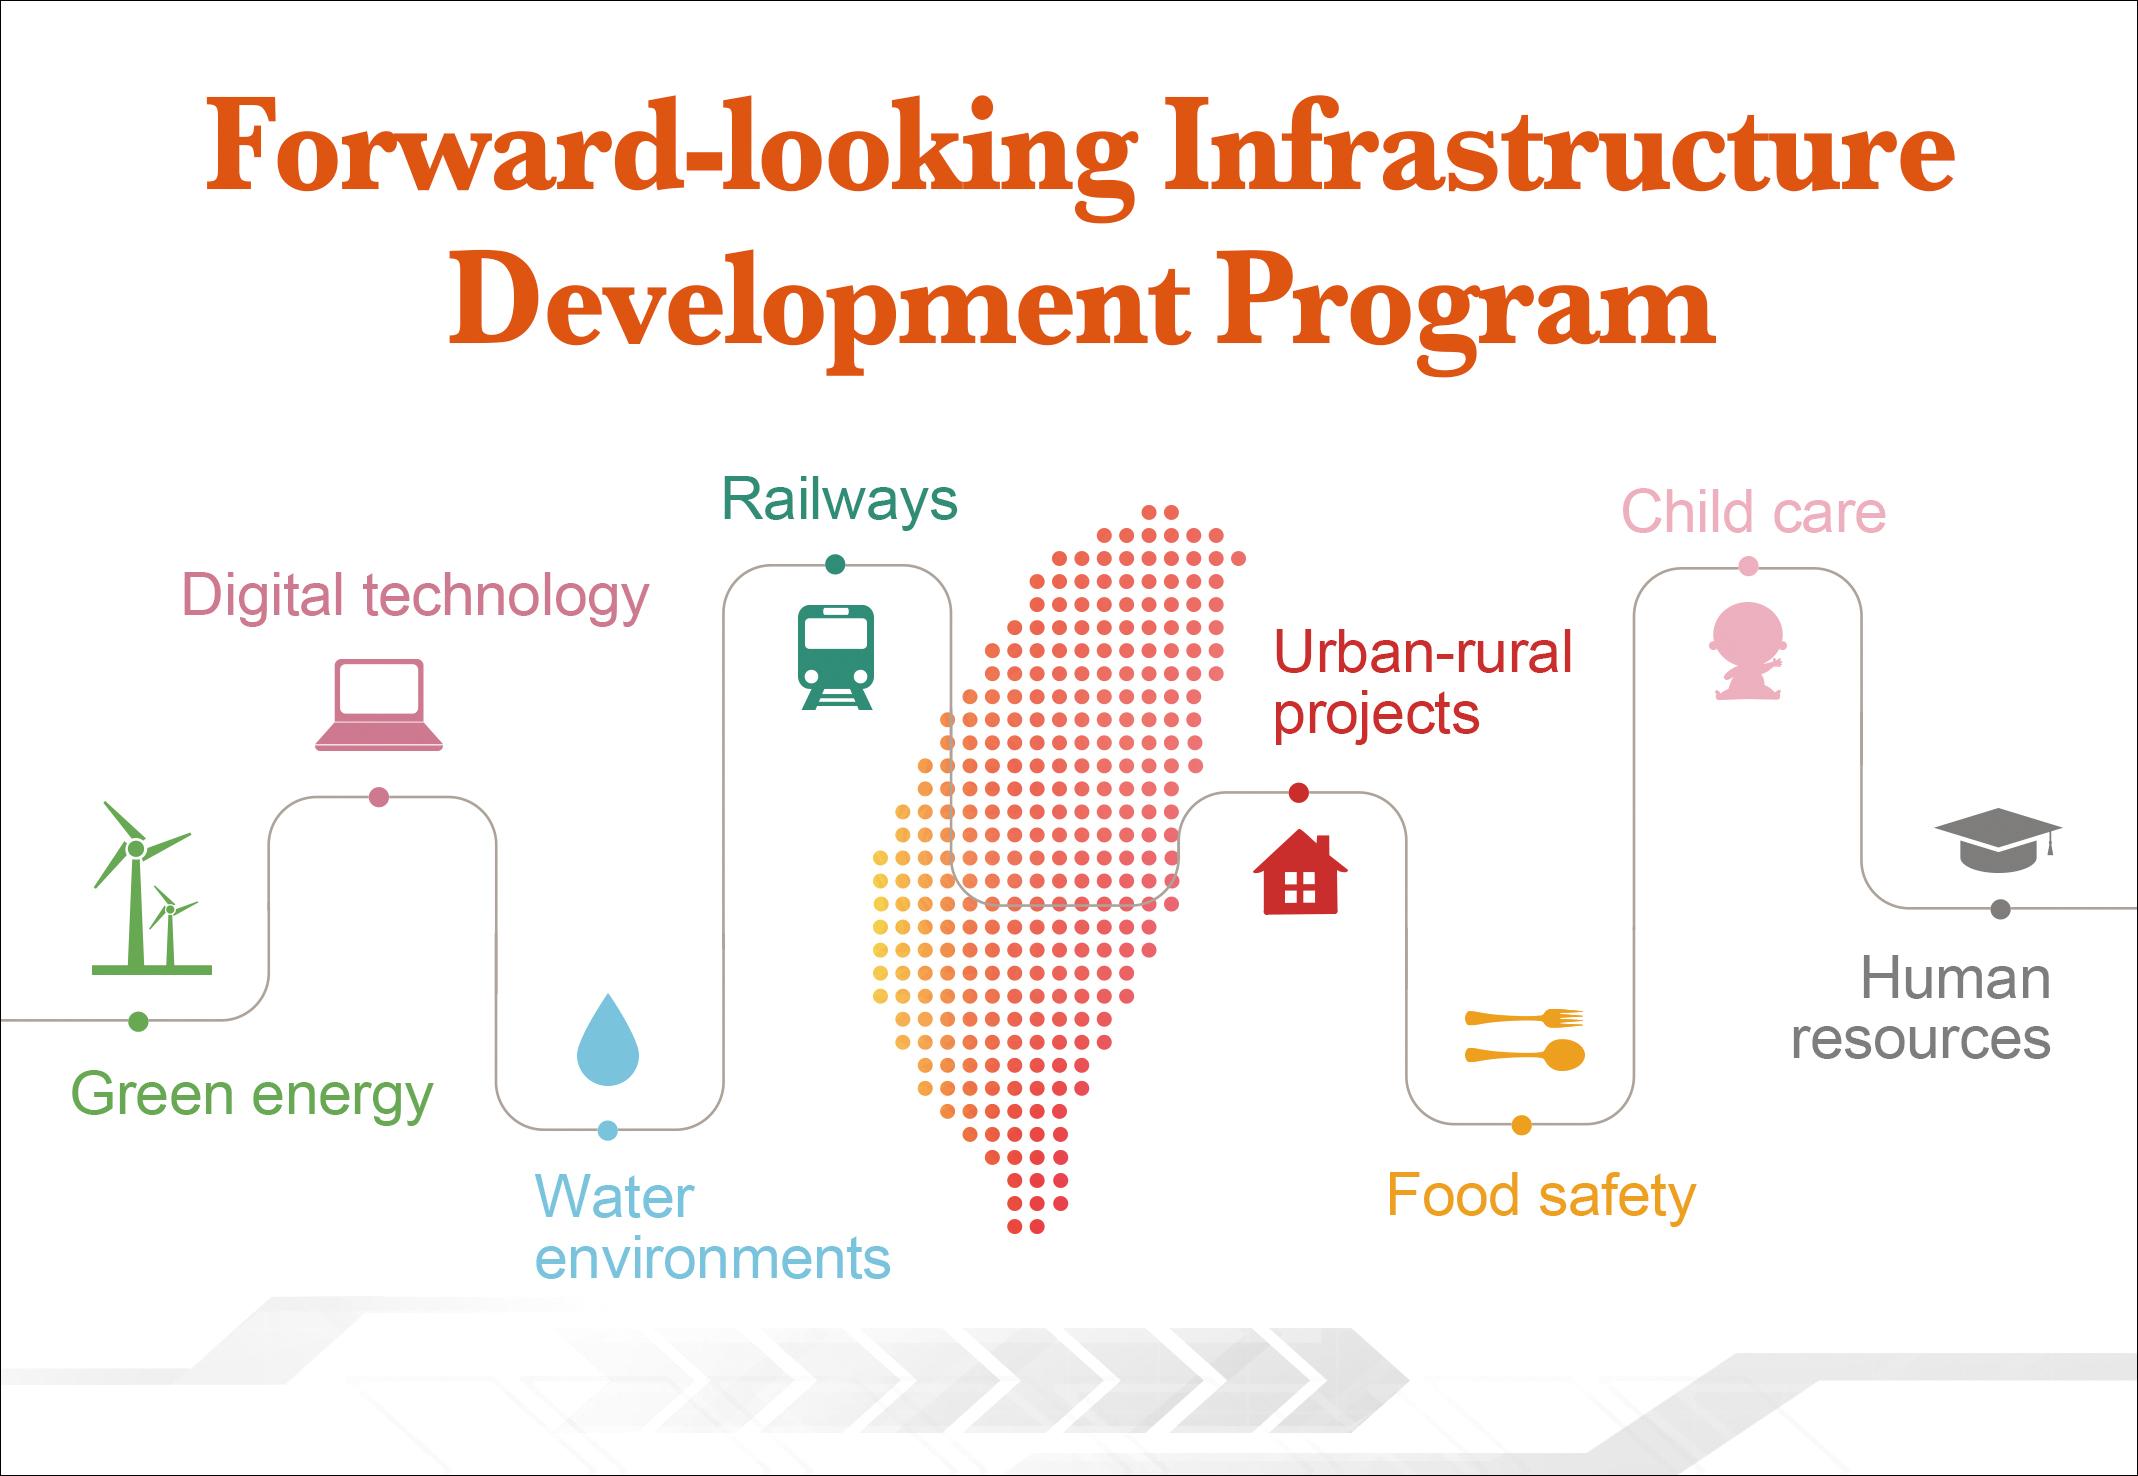 Forward-looking Infrastructure Development Program